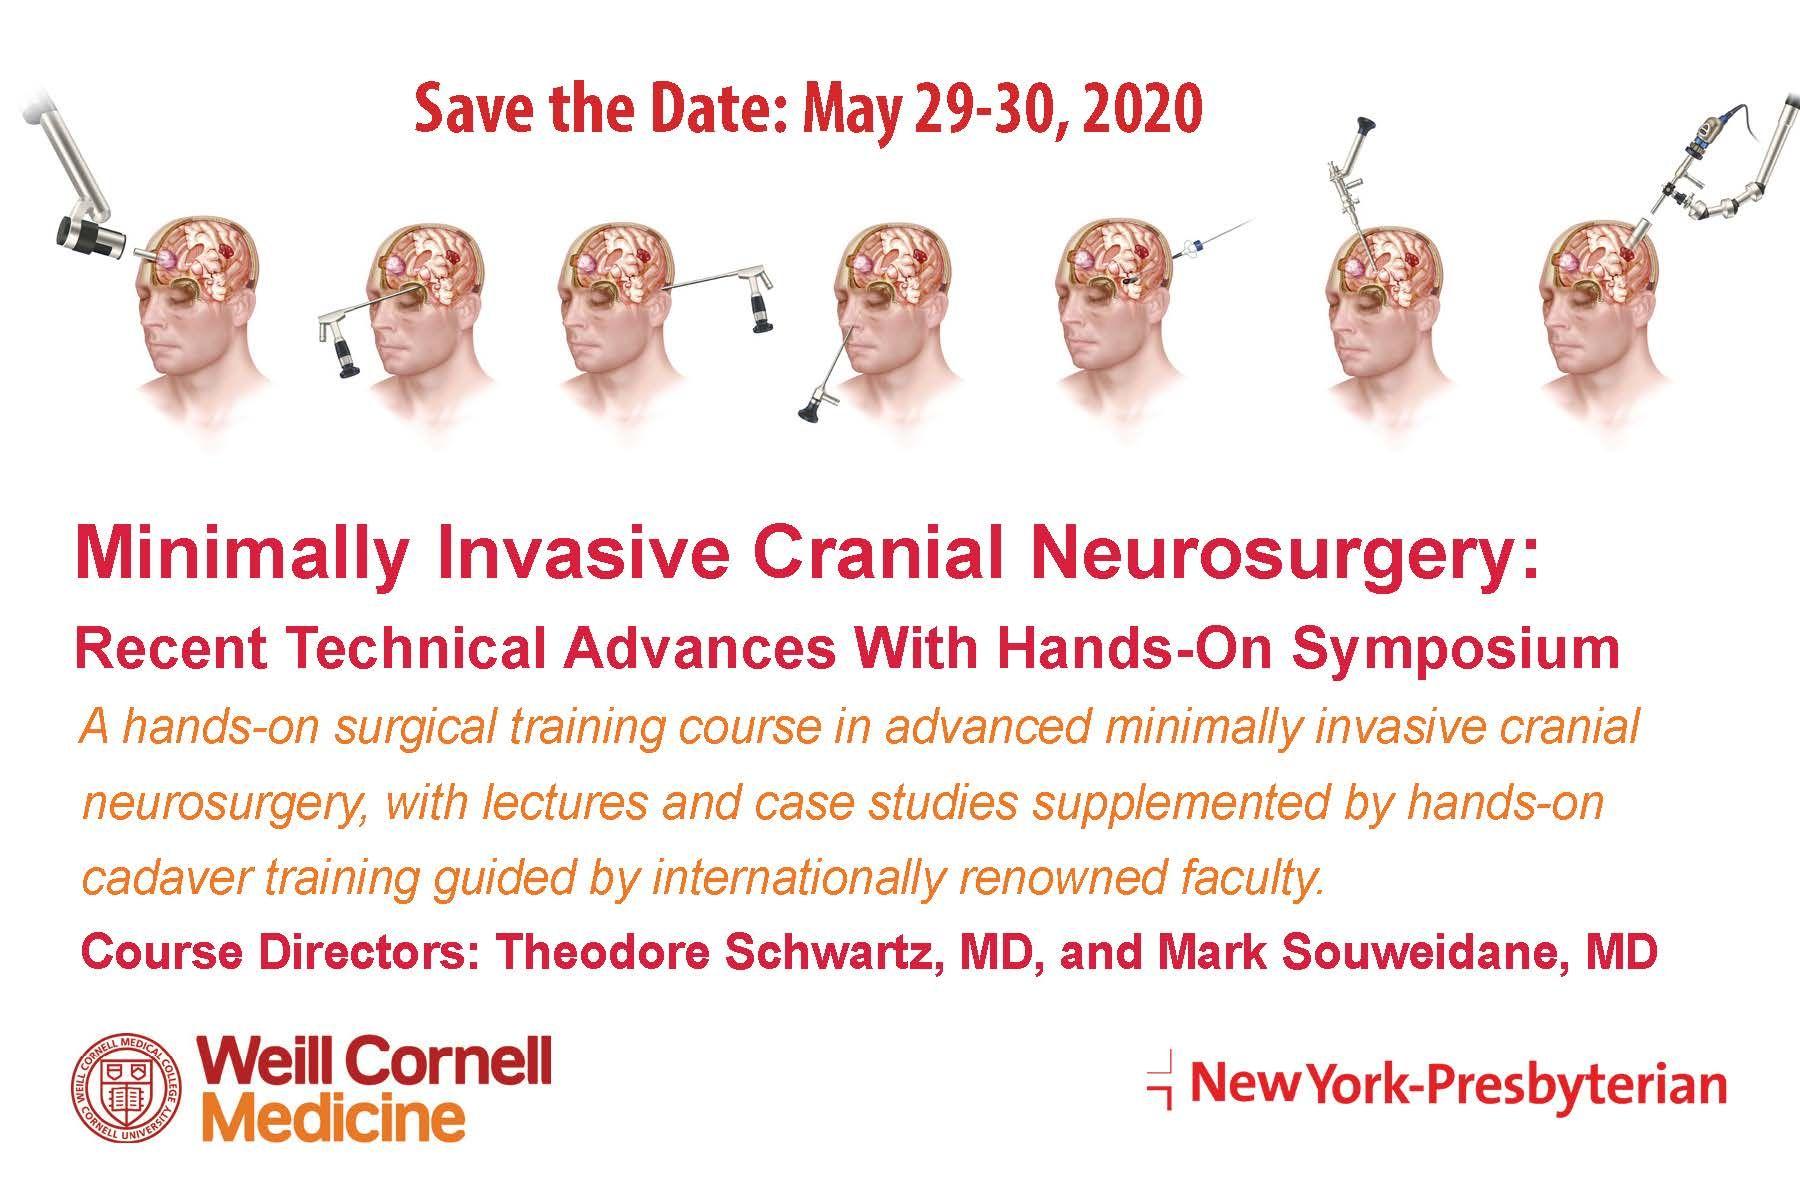 Minimally Invasive Cranial Neurosurgery CME - Weill Cornell